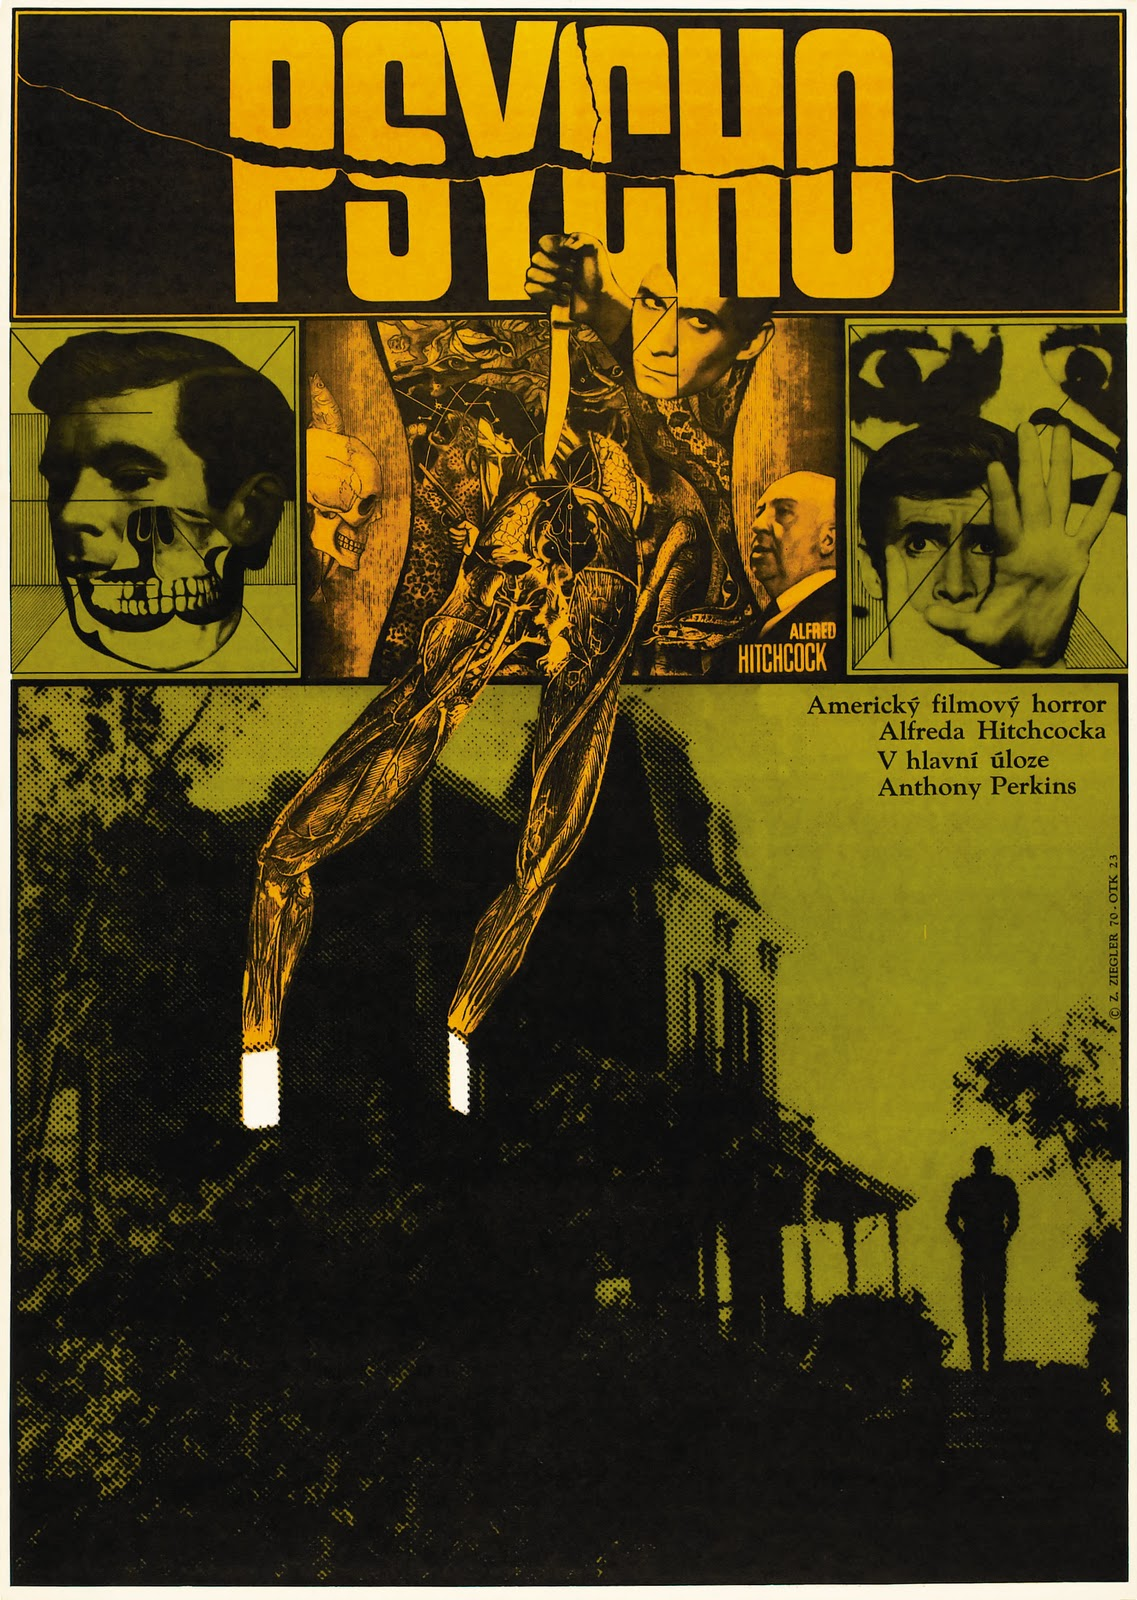 Original Movie Poster Art